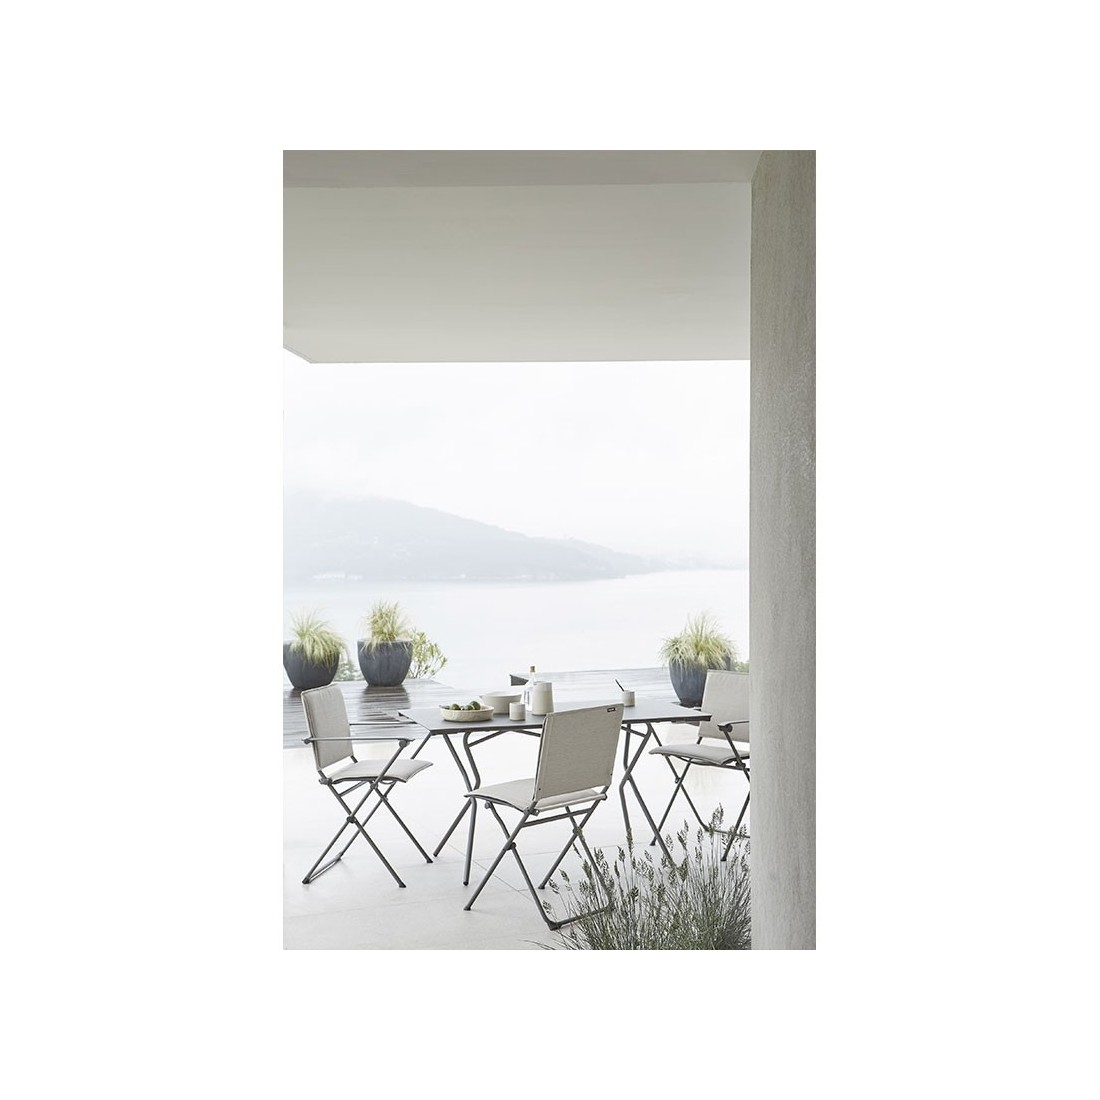 chaise de jardin pliante lafuma Chaise pliante ANYTIME de Lafuma, ambiance cocooning et bien être  chaise de jardin pliante lafuma